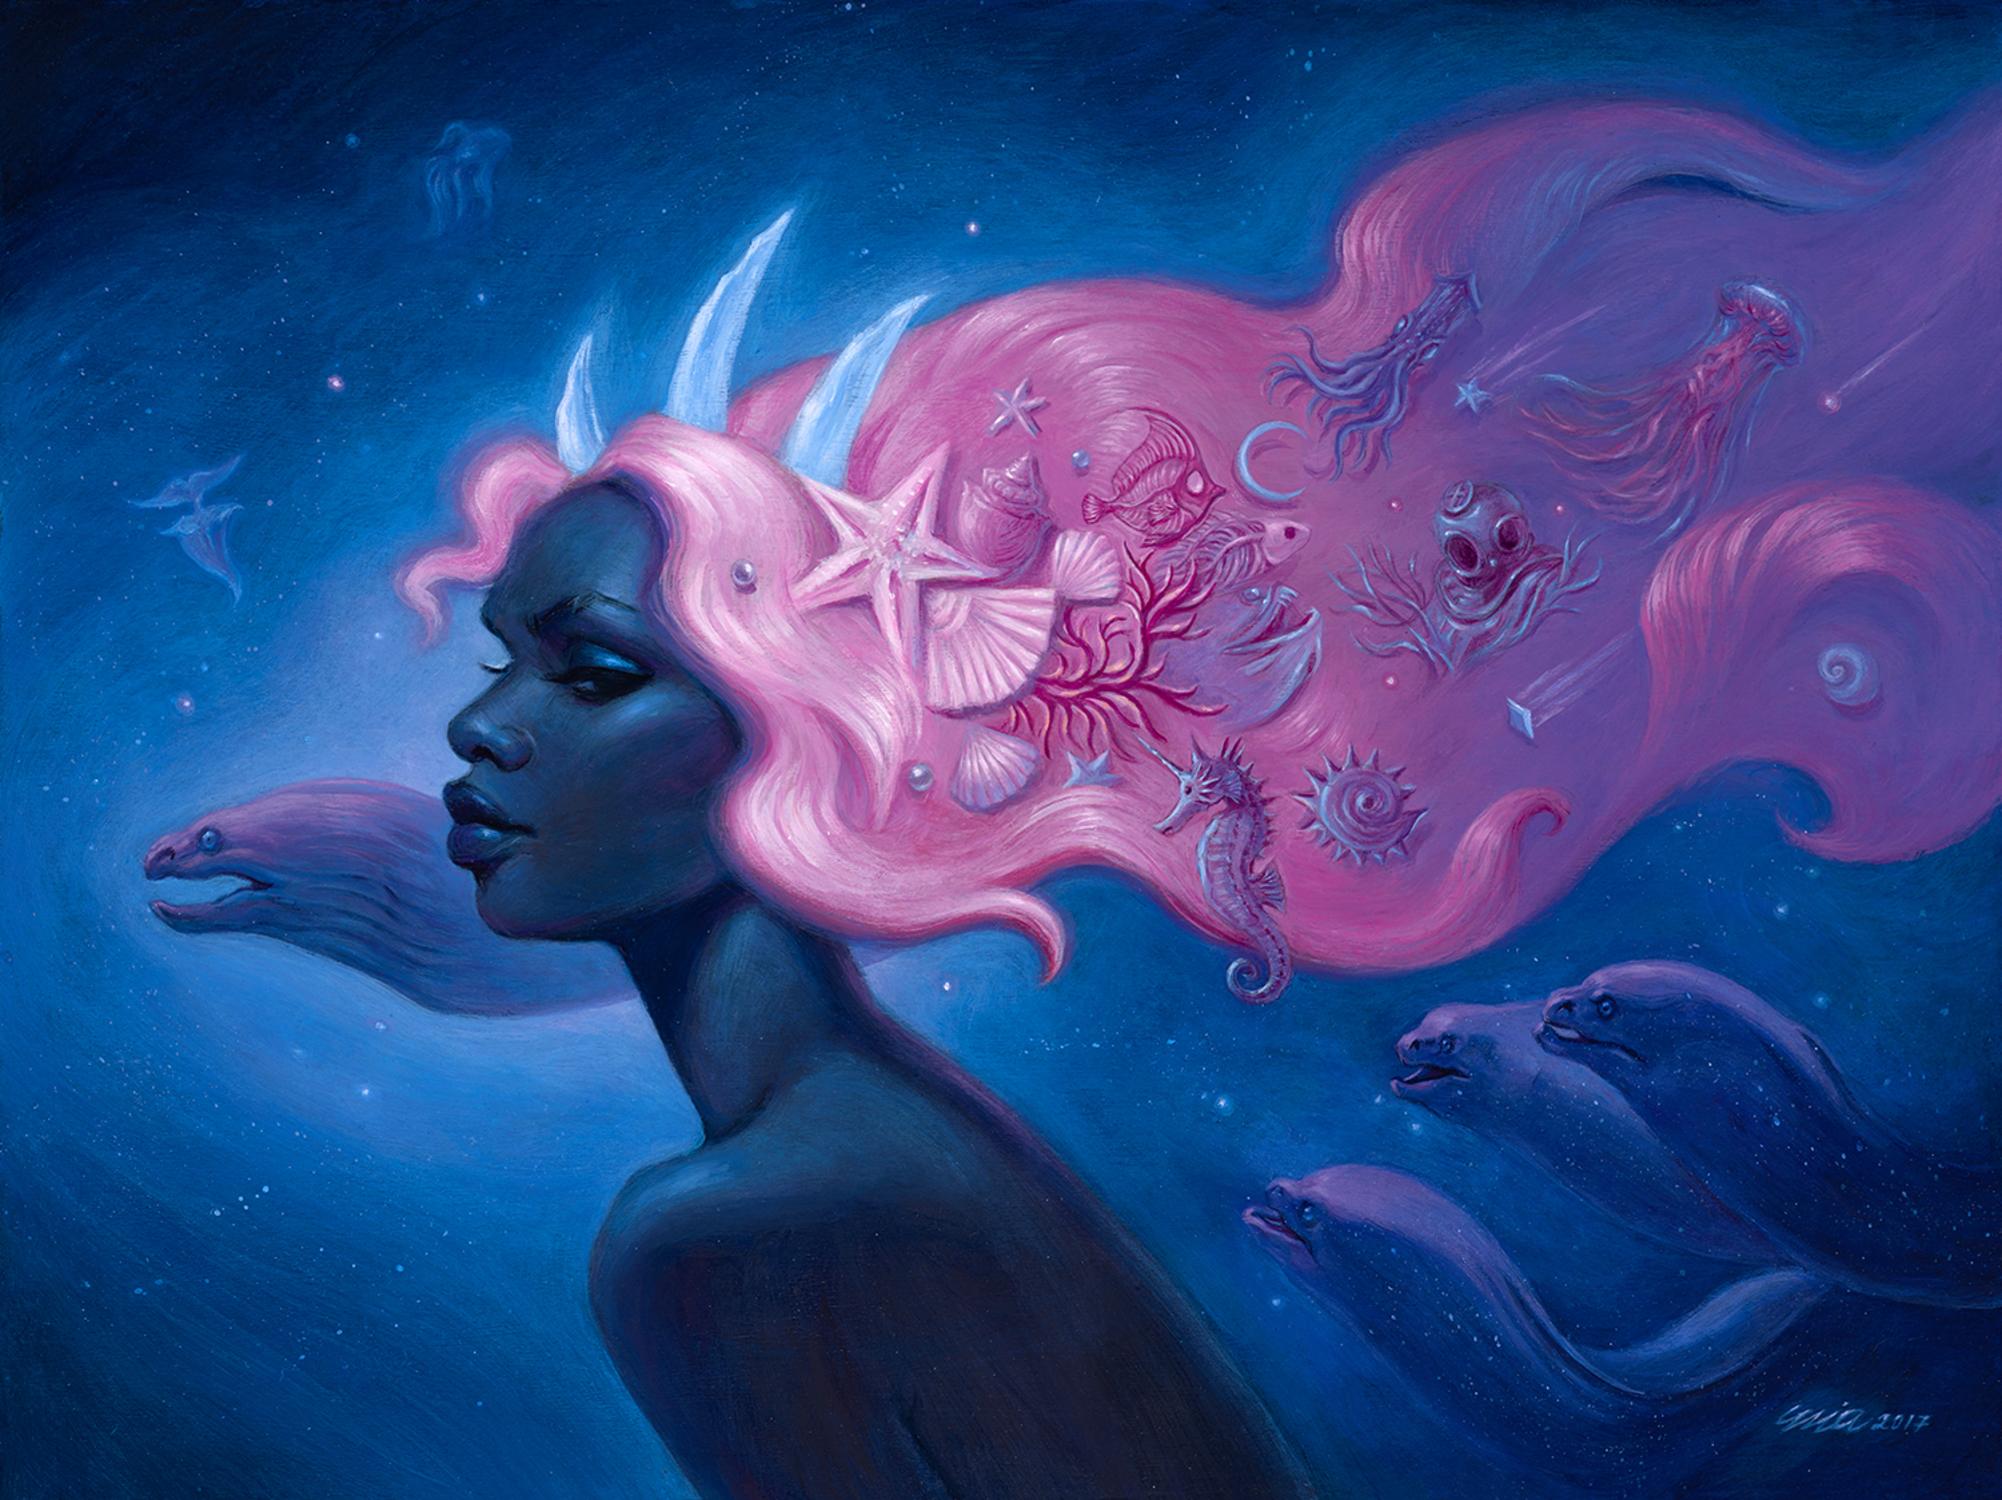 Cosmic Mermaid Artwork by Mia Araujo